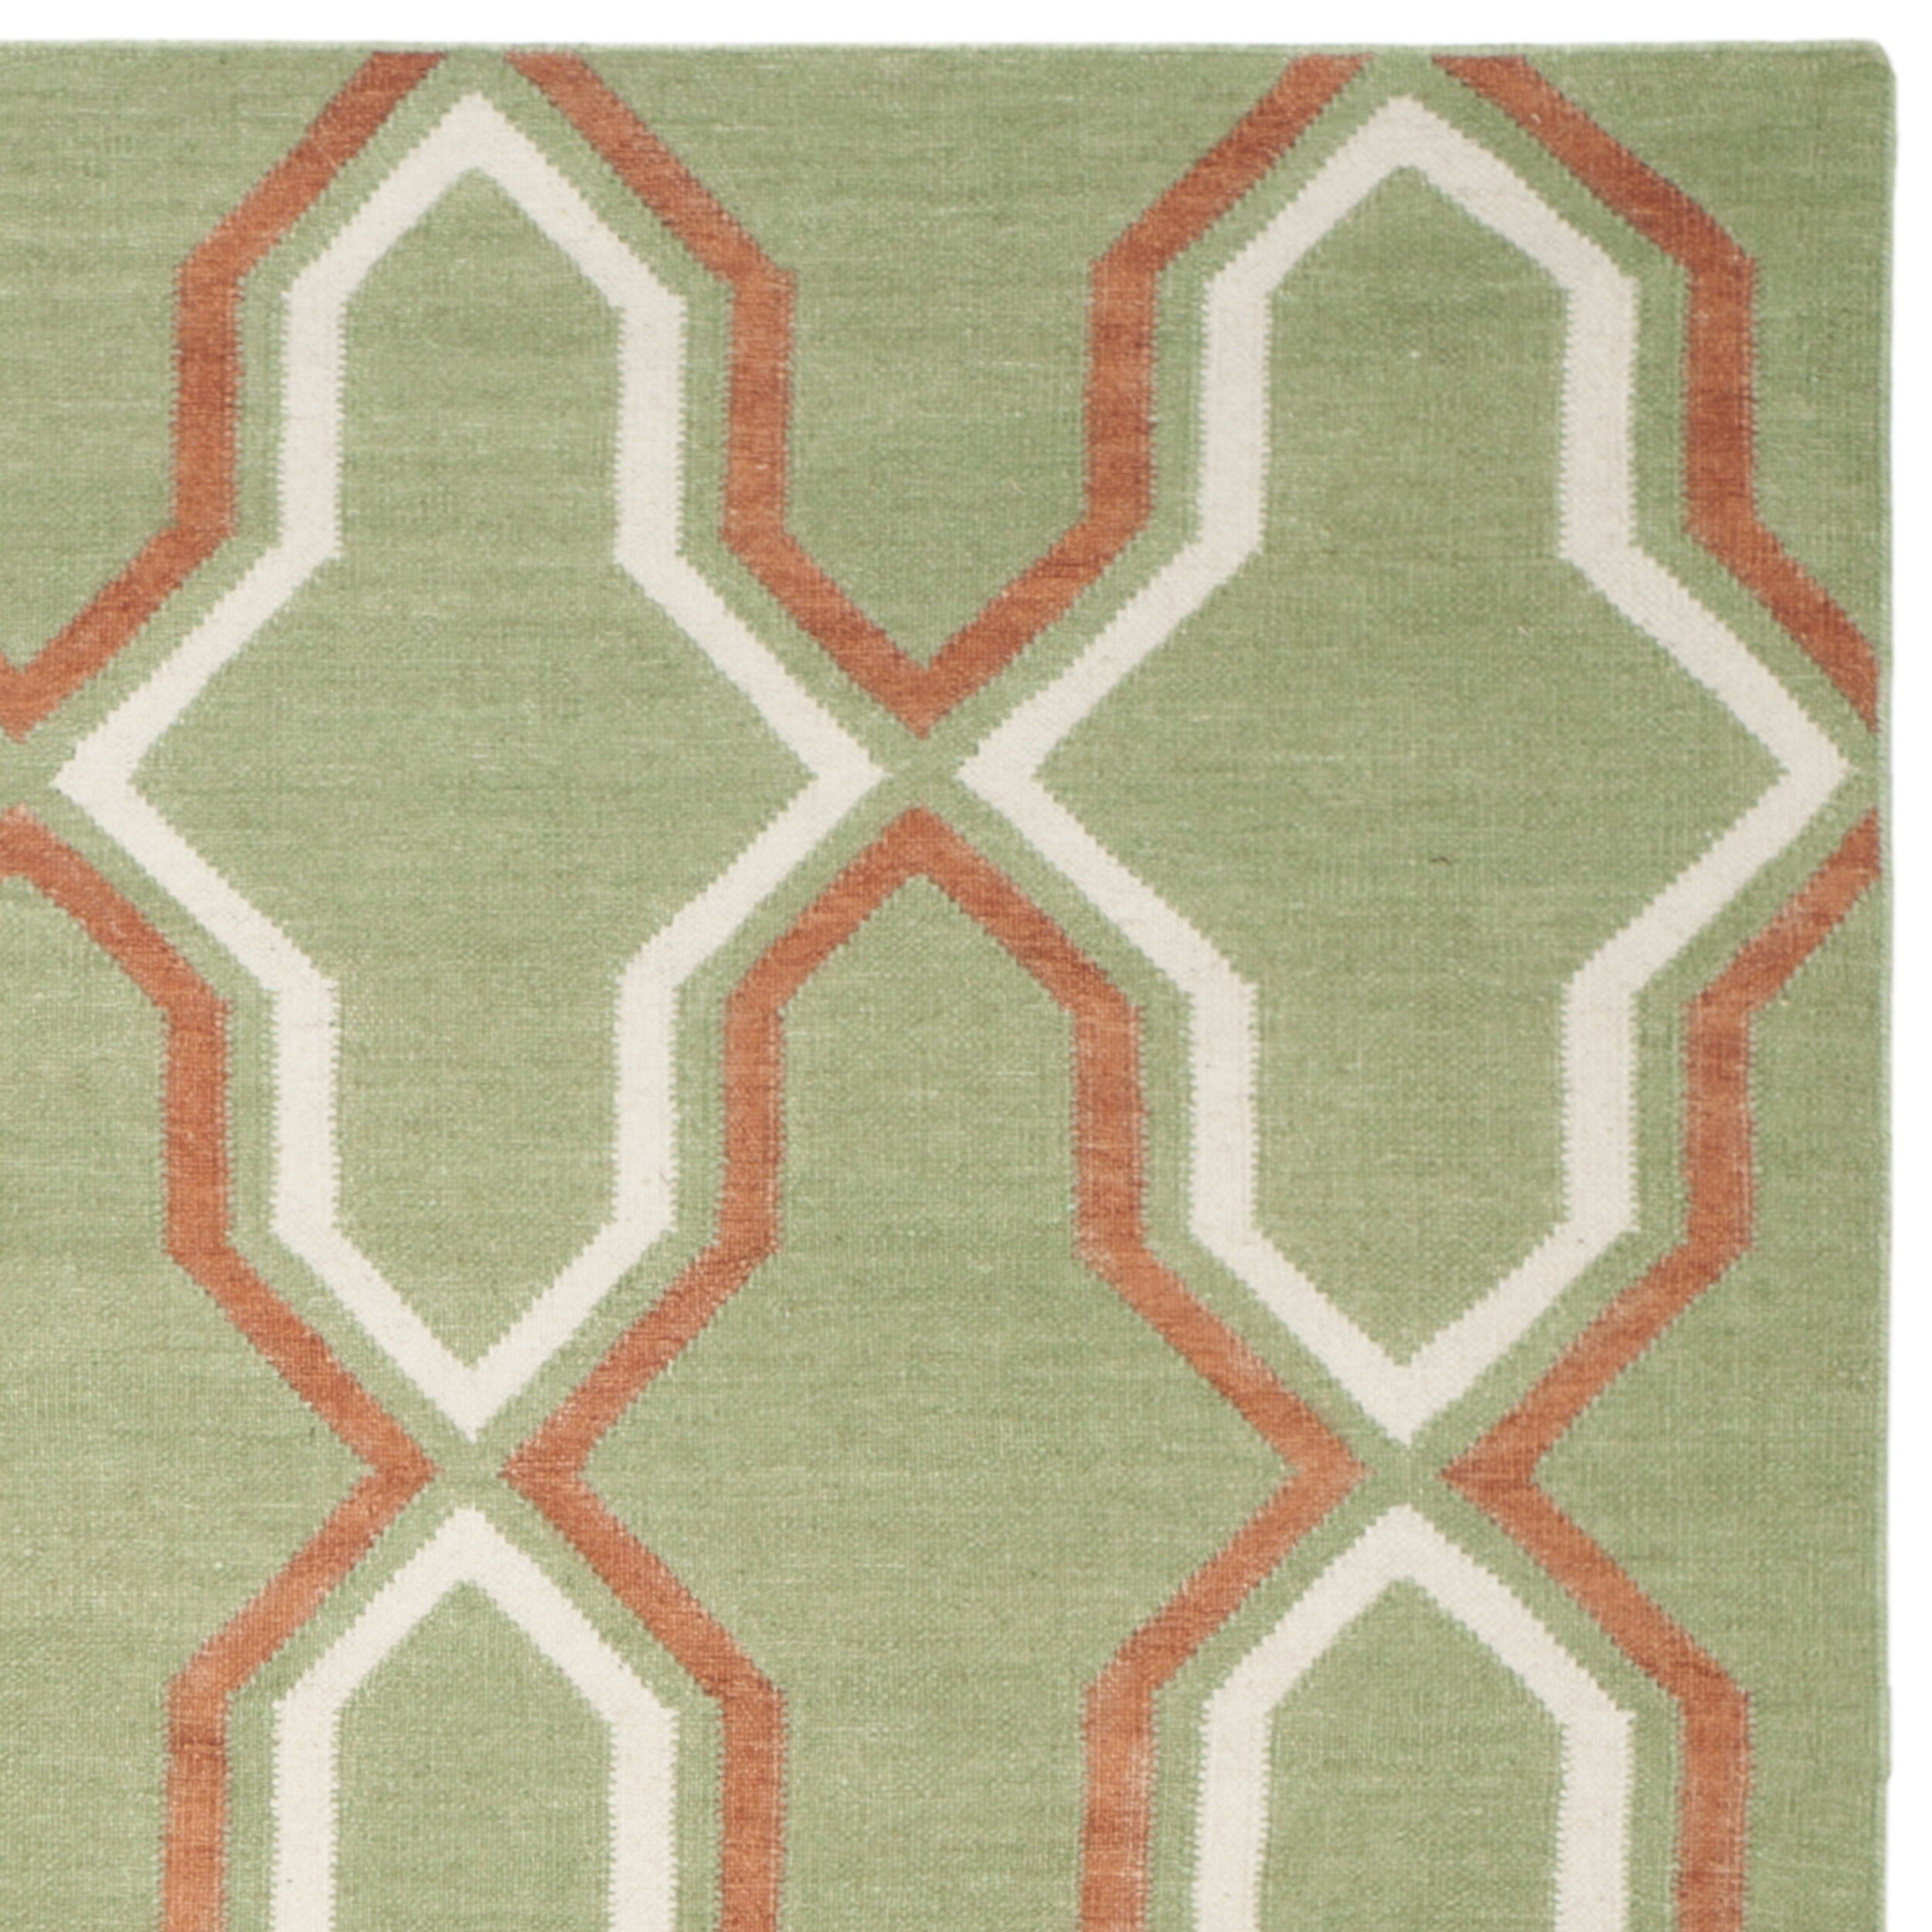 Safavieh Dhurries Green / Orange Contemporary Area Rug